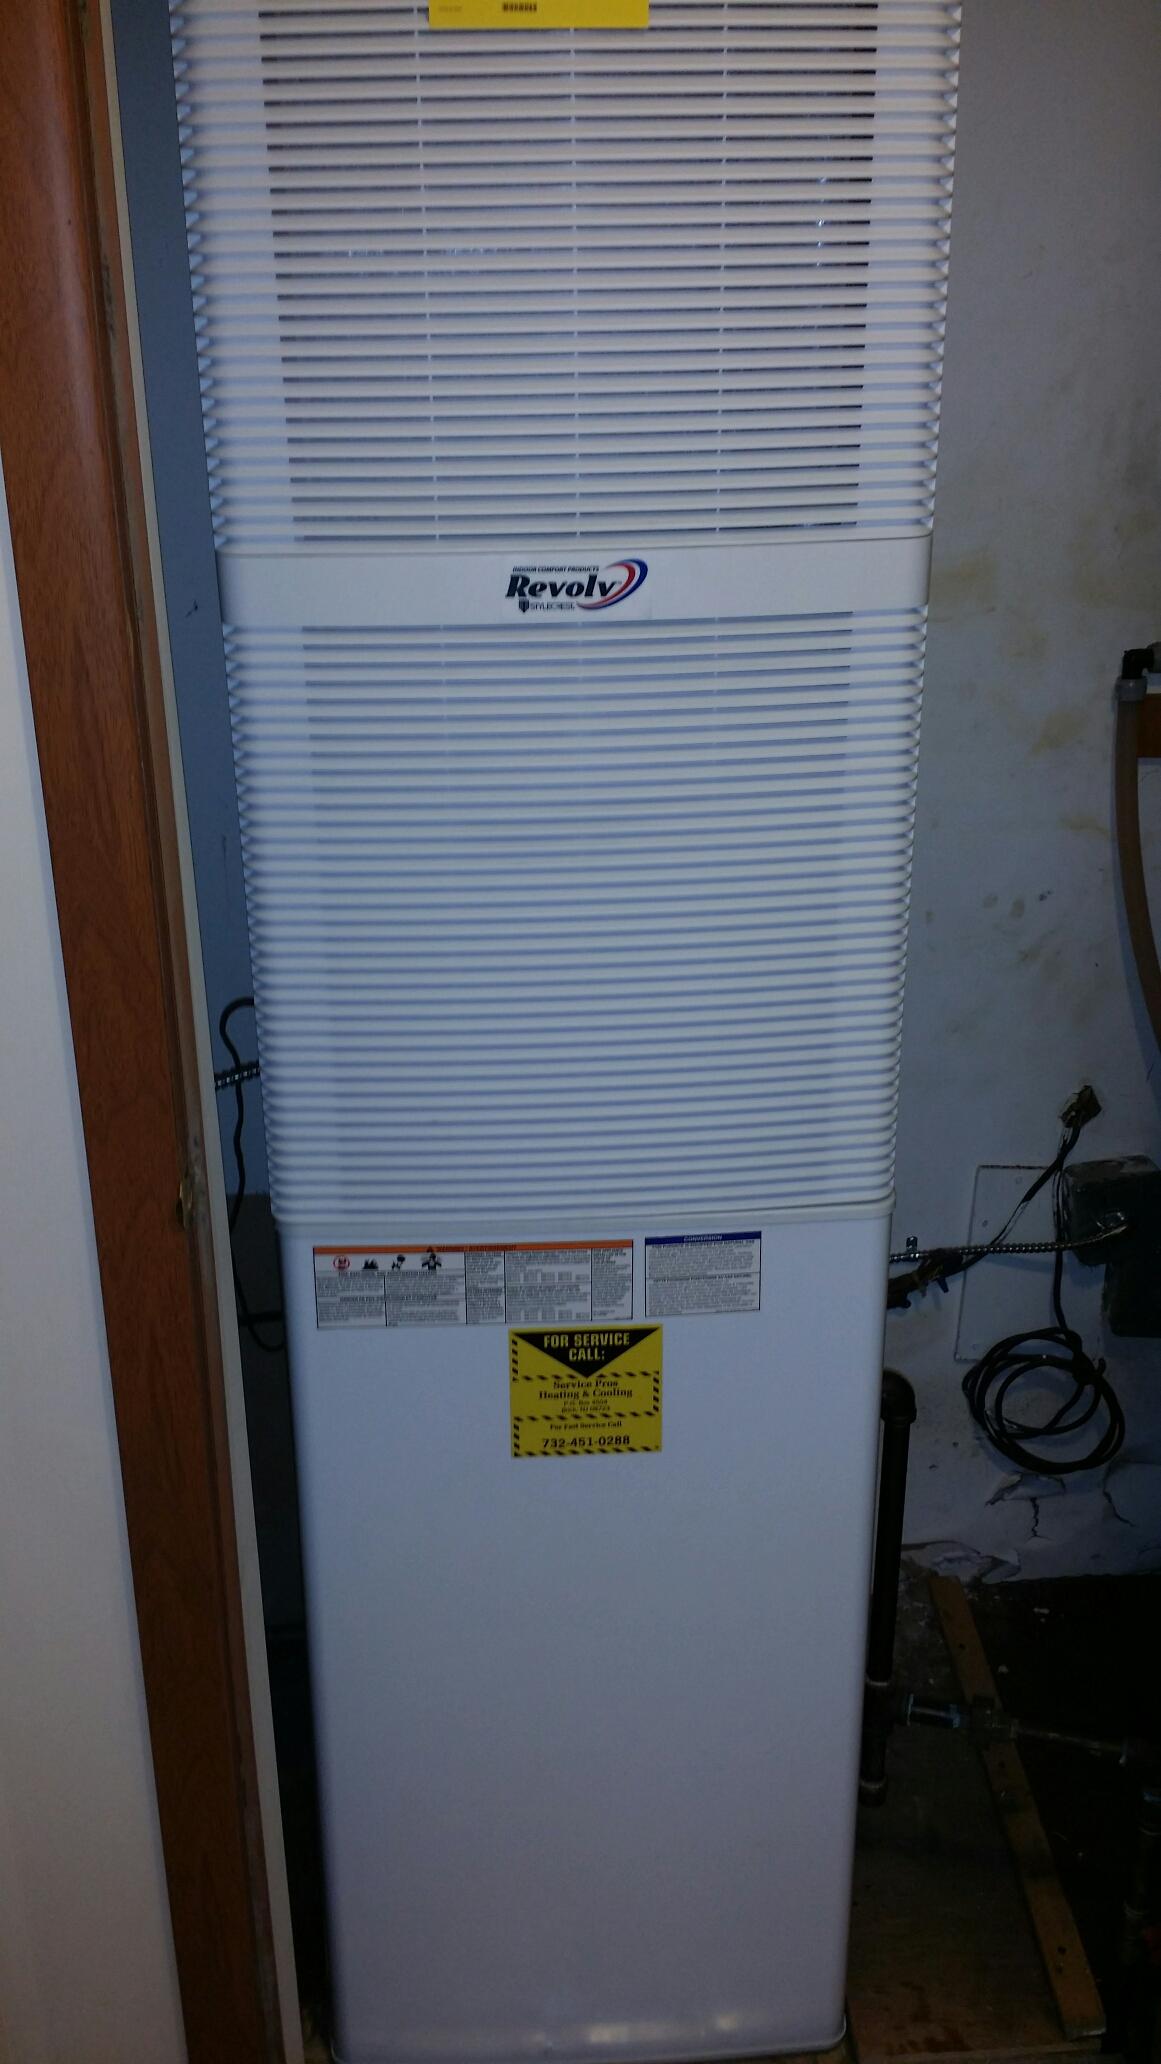 Furnace Repair and Air Conditioner Repair in Freehold NJ